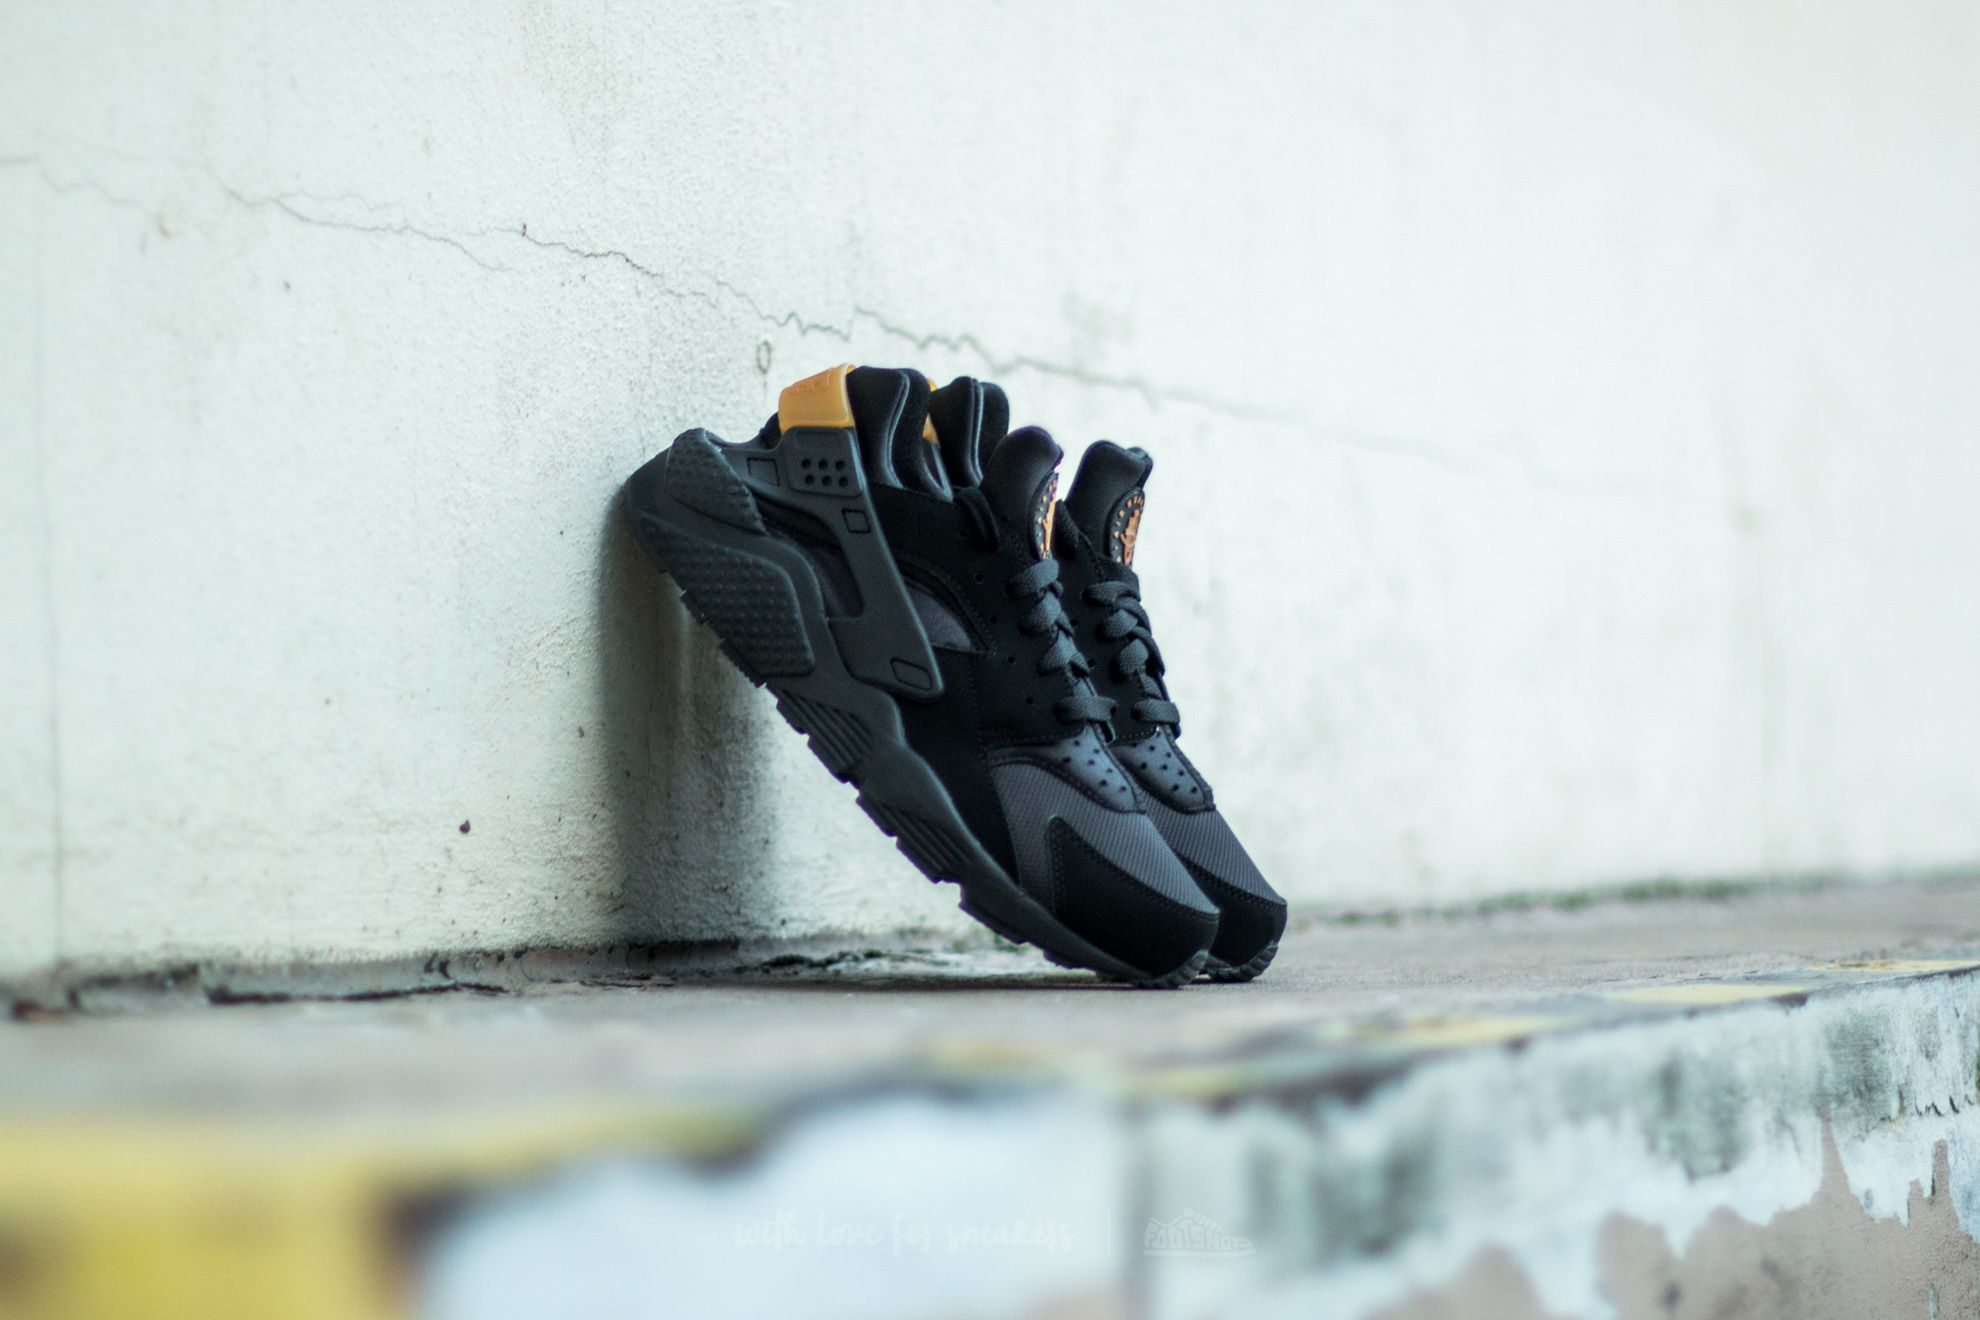 Metallic GoldFootshop Nike Black Air Huarache 0wm8ynOPvN